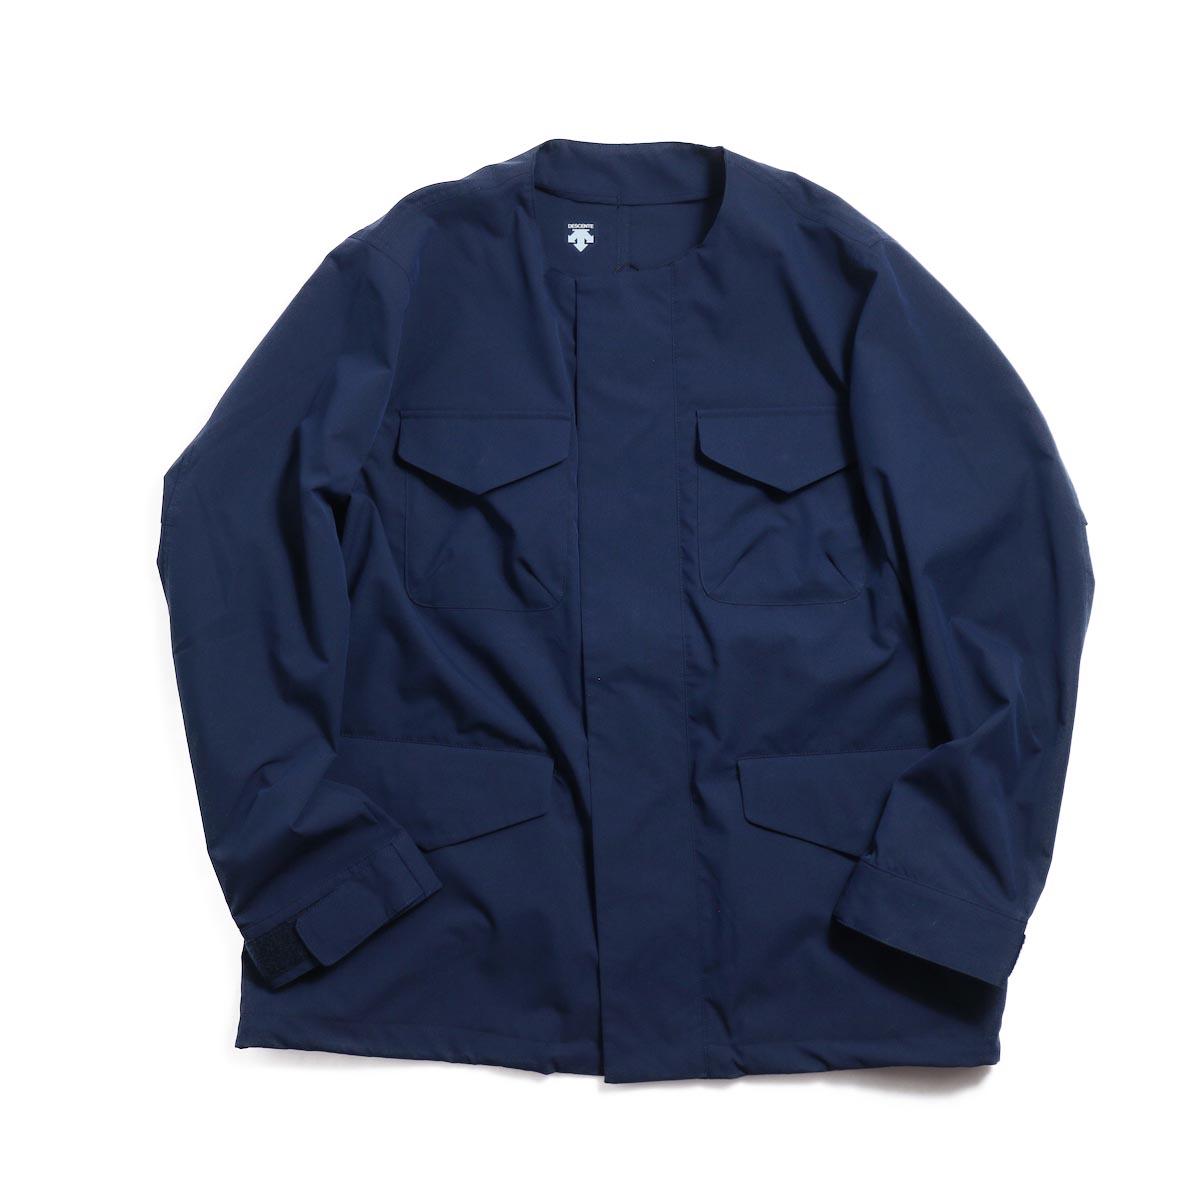 DESCENTE ddd / Utility Jacket -Navy 正面